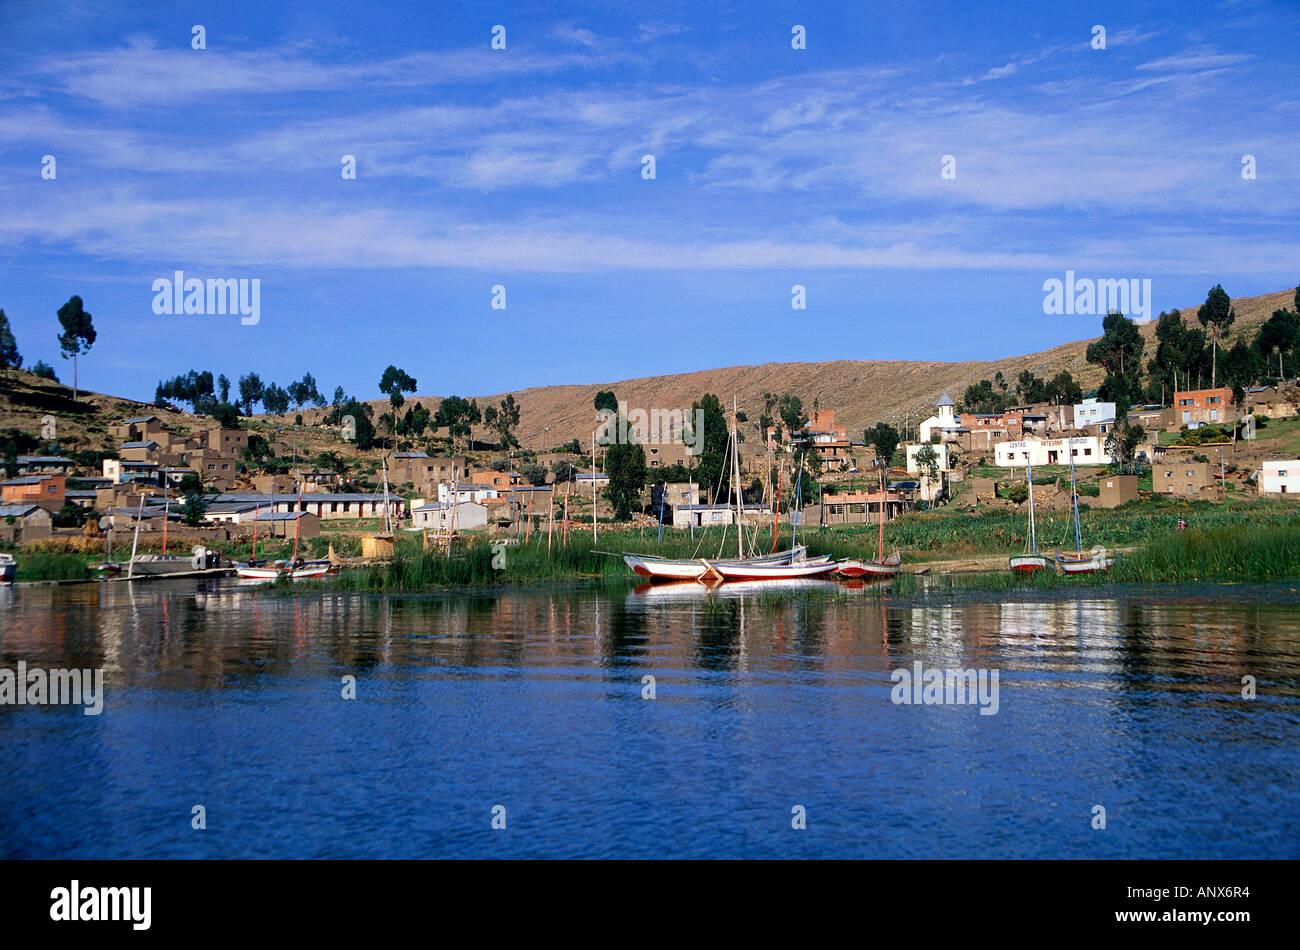 village of puerto perez suriqui islet lake titicaca bolivia - Stock Image